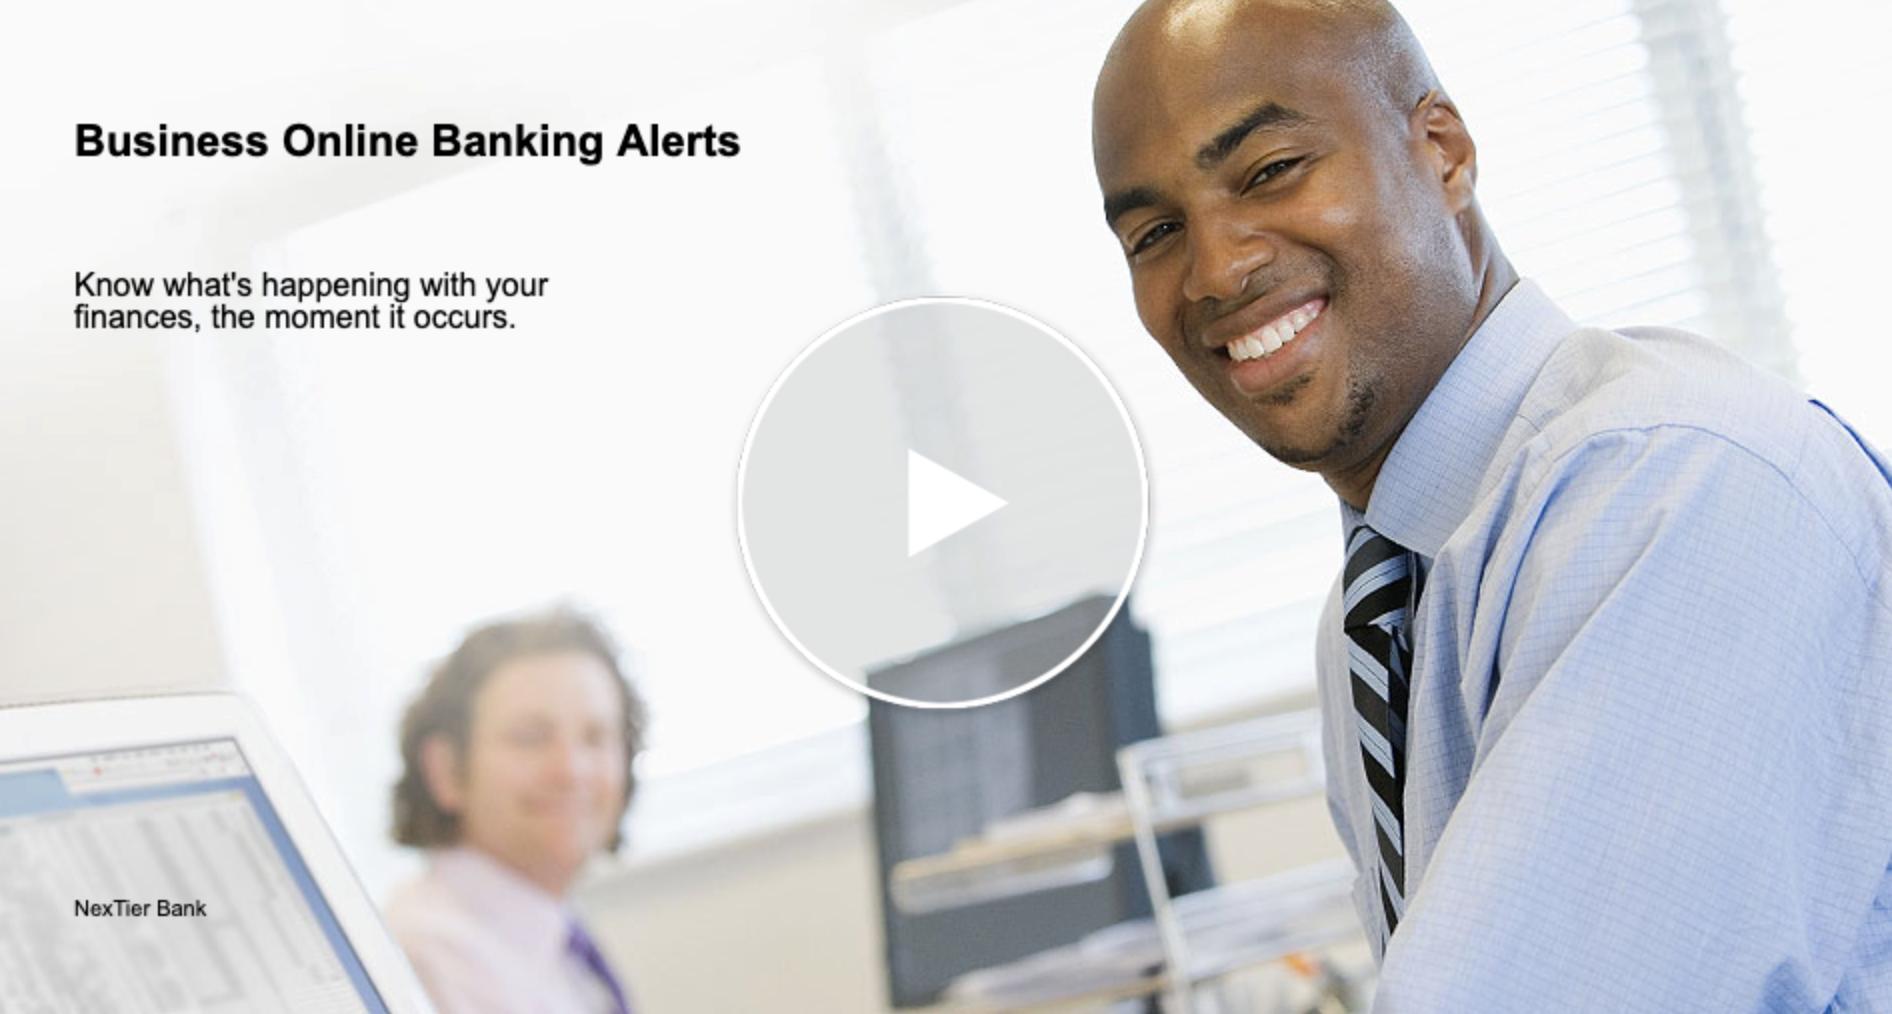 Business Online Banking Alerts